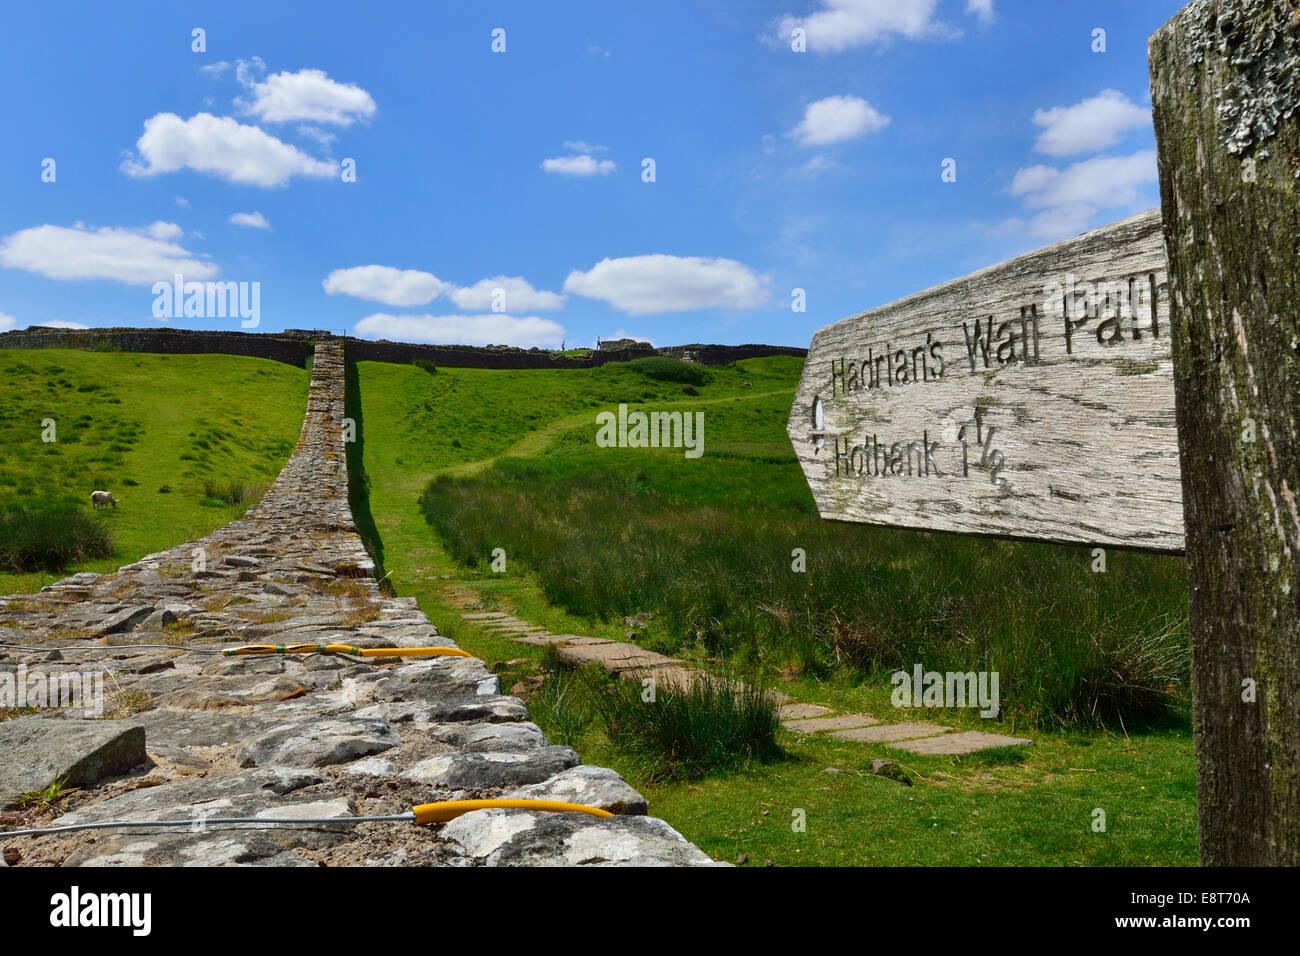 Hadrian's Wall meandering through the landscape, Housesteads Roman Fort, Haydon Bridge, Hexham, Northumberland, Stock Photo